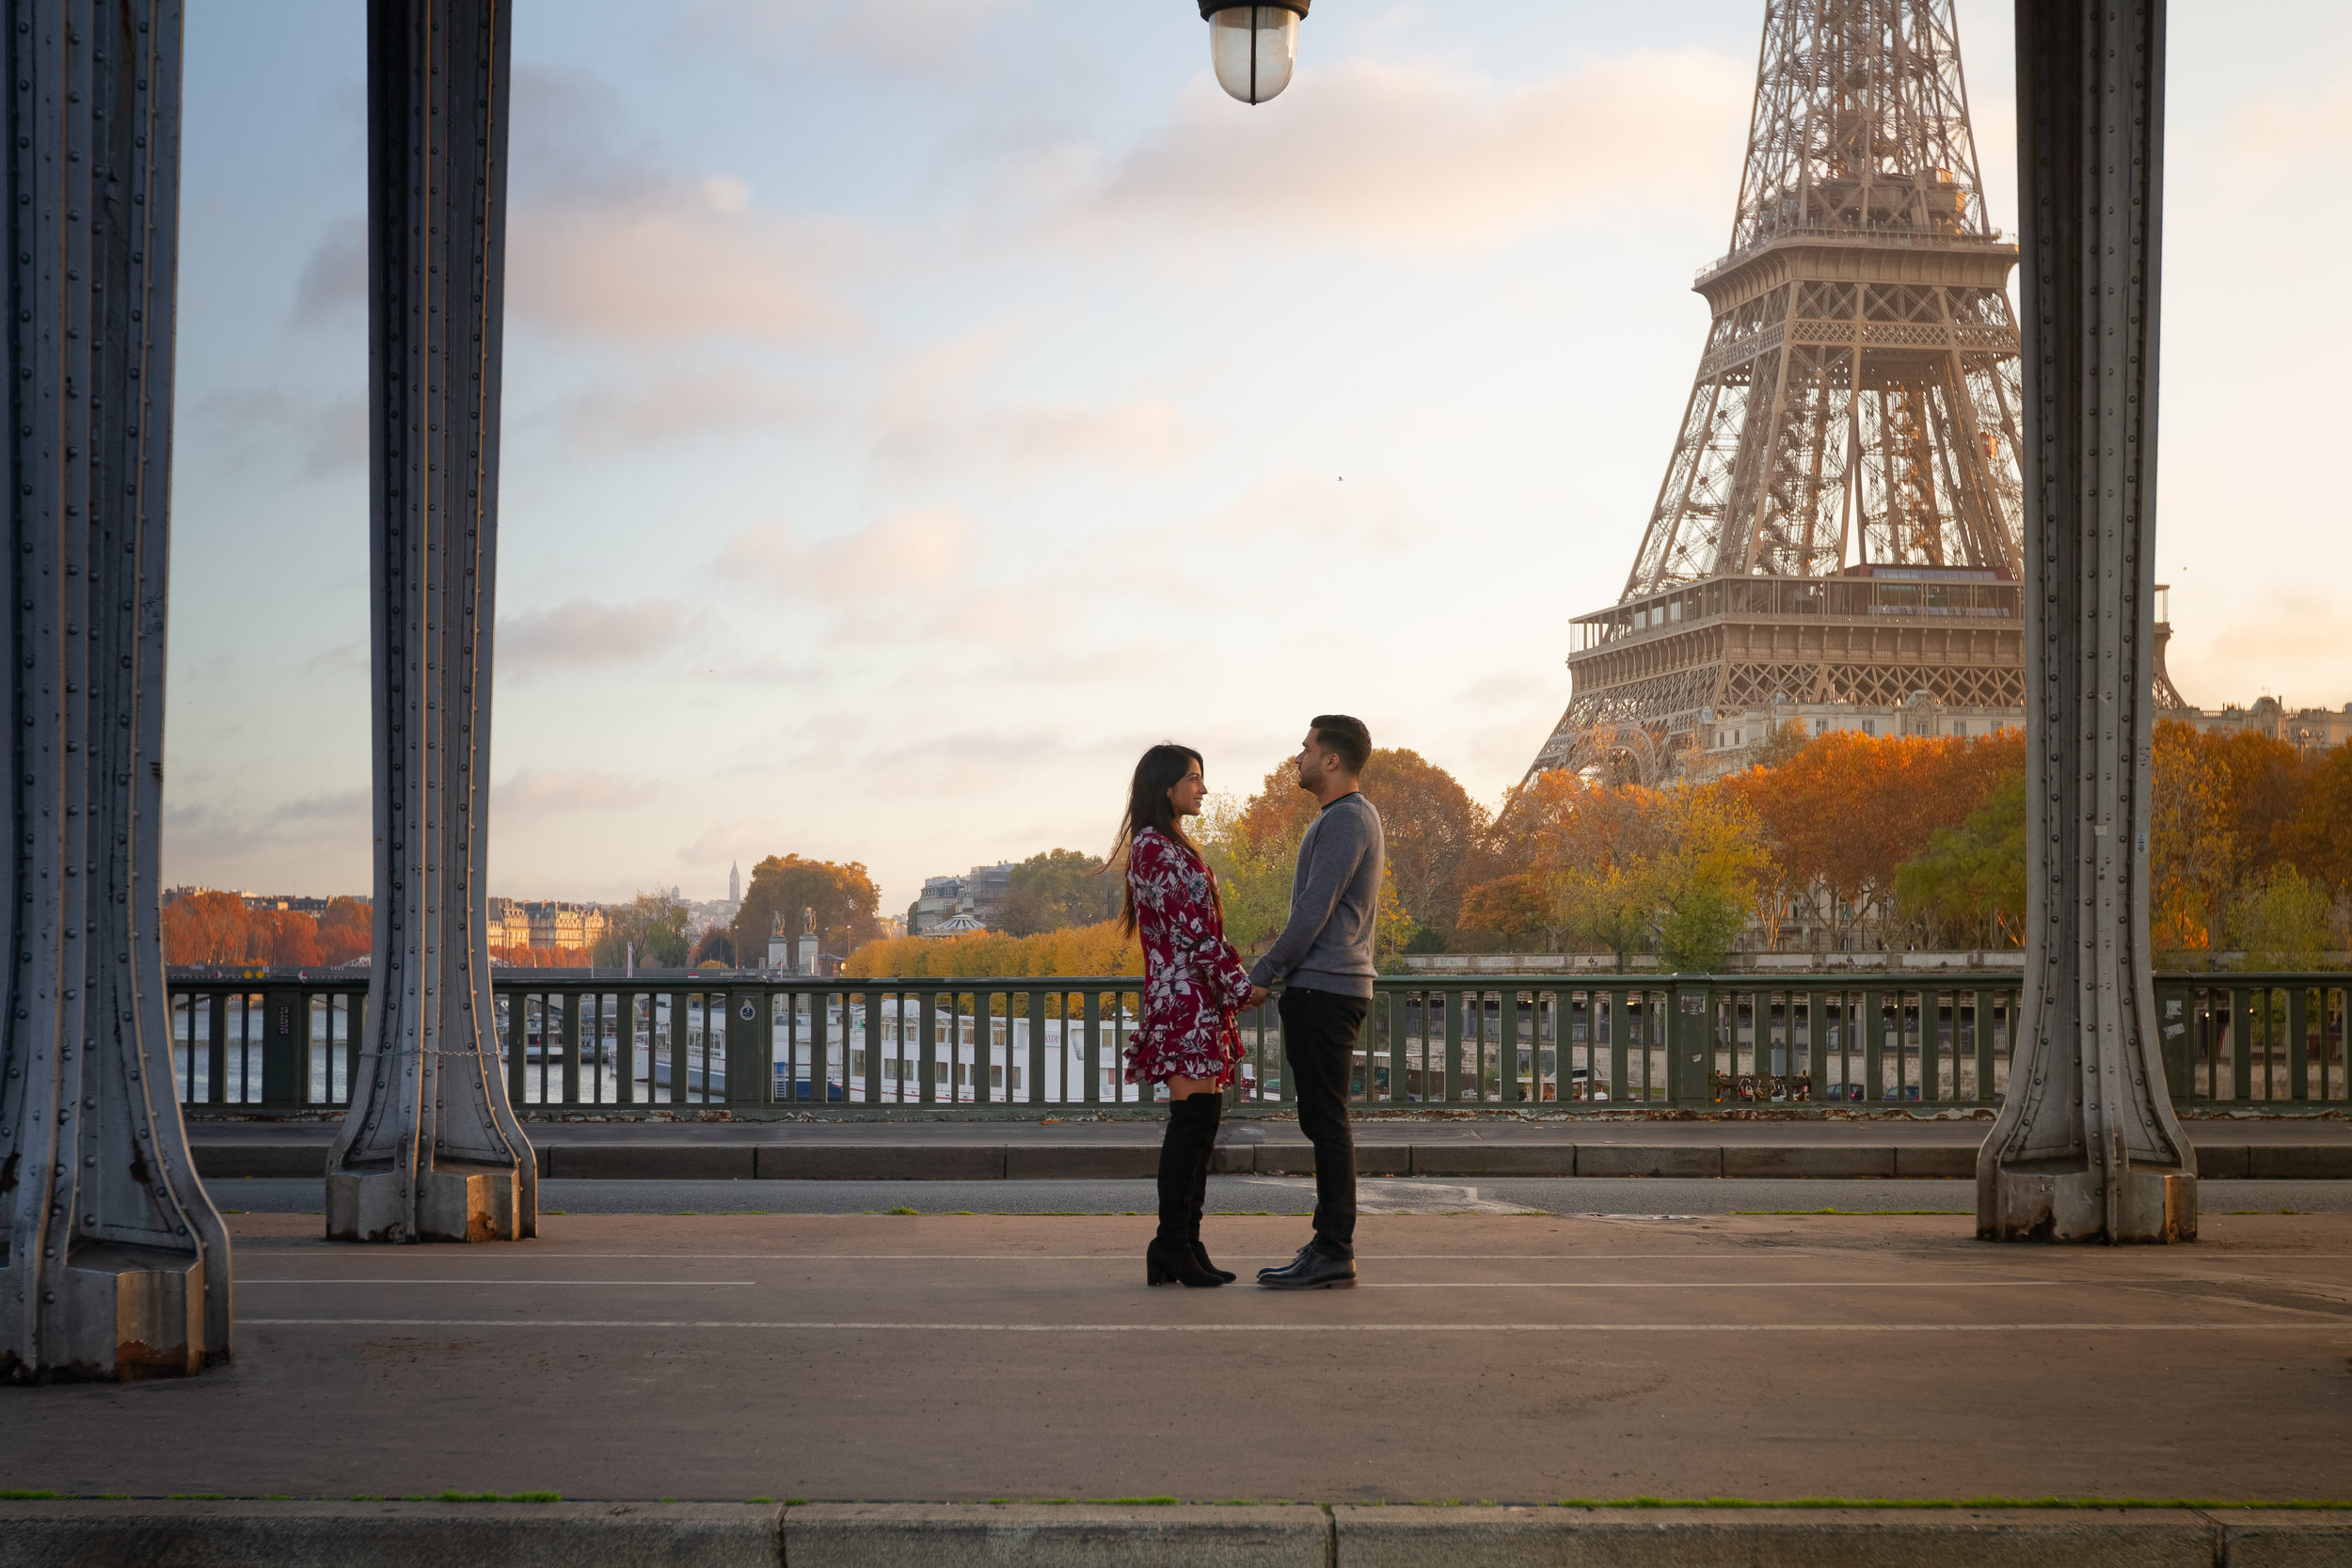 Photo by: Shoot My Travel Photographer Joe in Paris